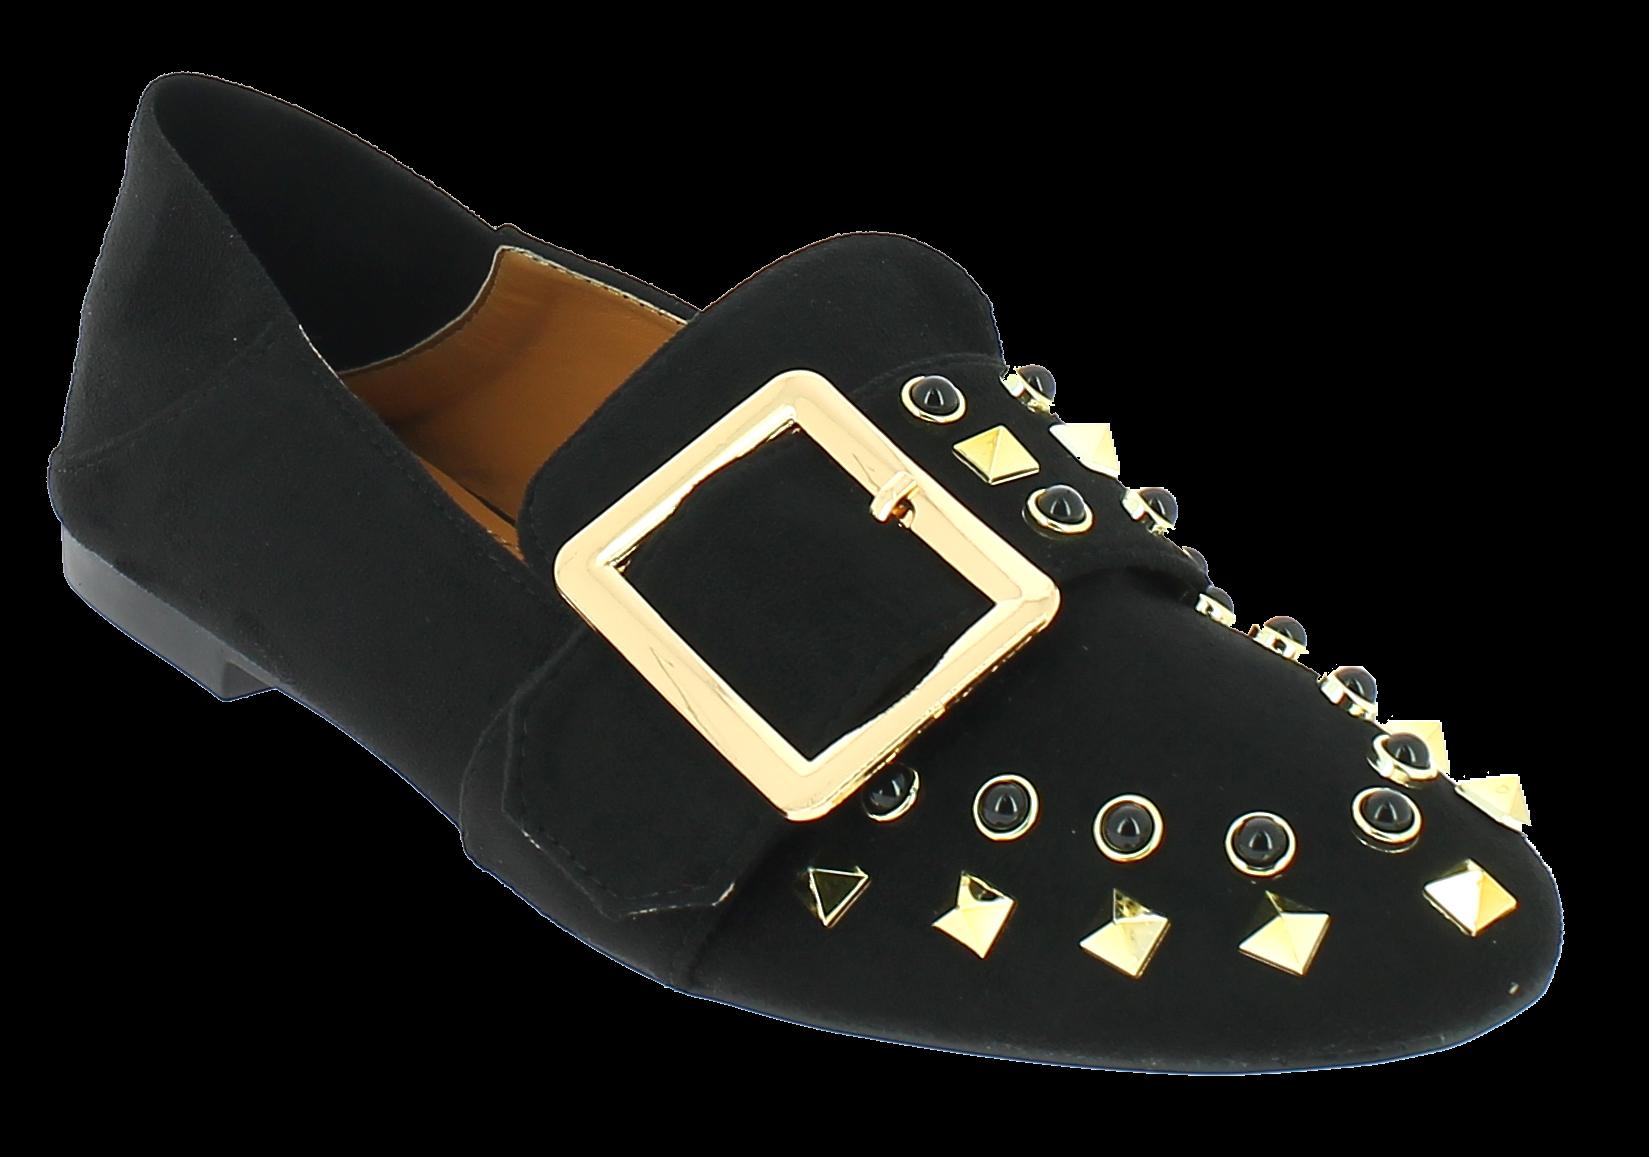 8cc9700502 IQSHOES Γυναικεία Μπαλαρίνα 17451 Μαύρο IqShoes BLACK black 41 1 15 ...